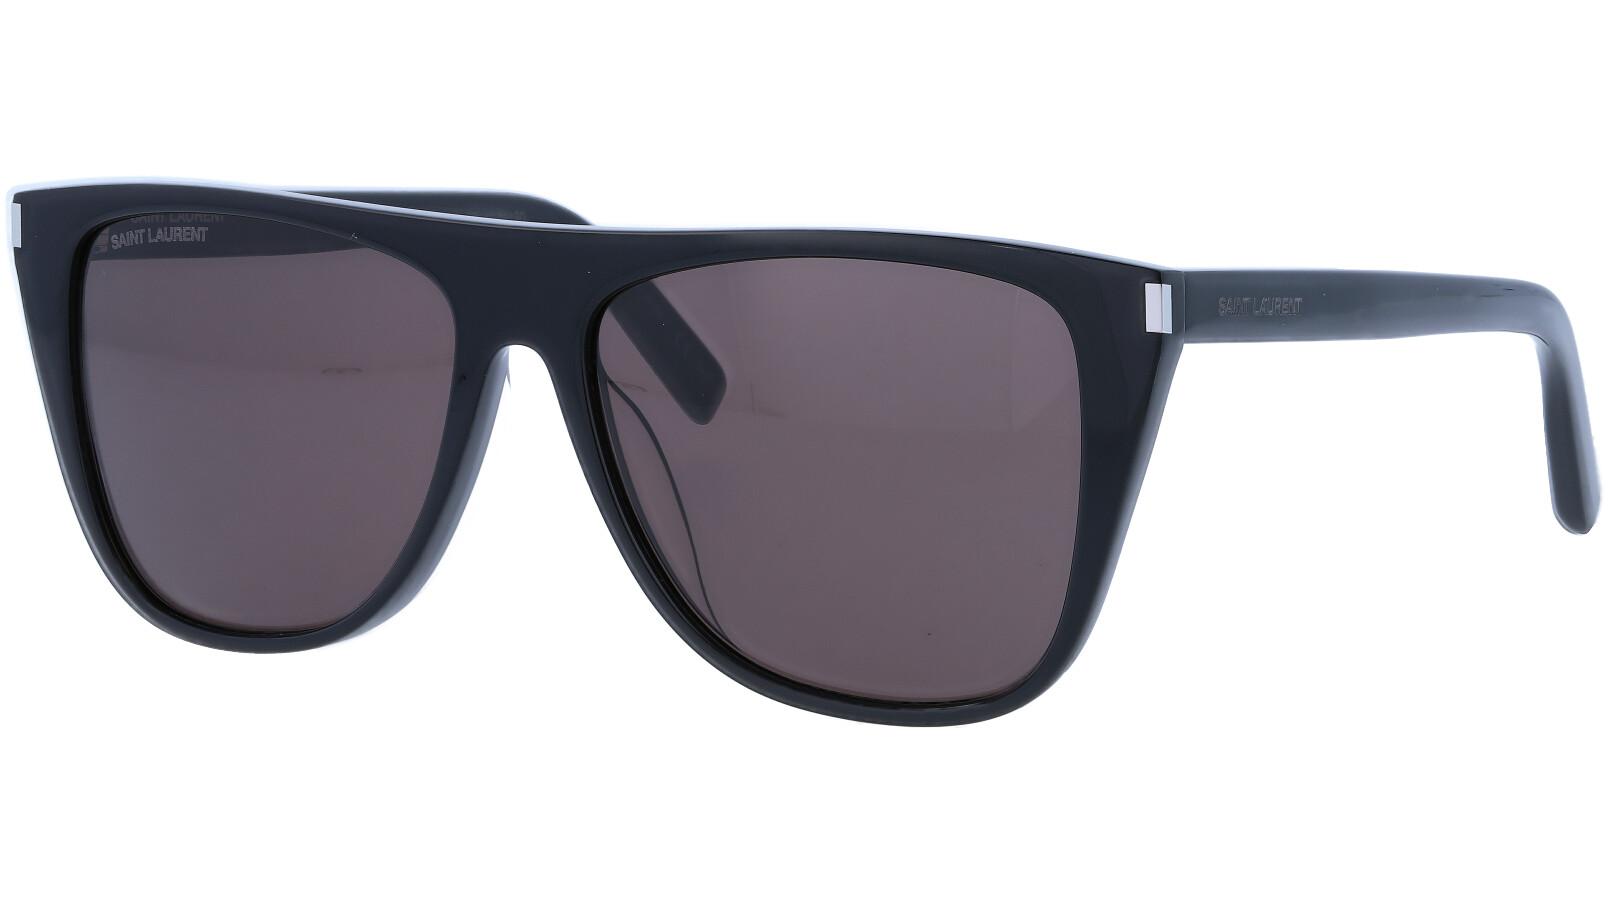 Saint Laurent SL1F 001 58 Black Sunglasses